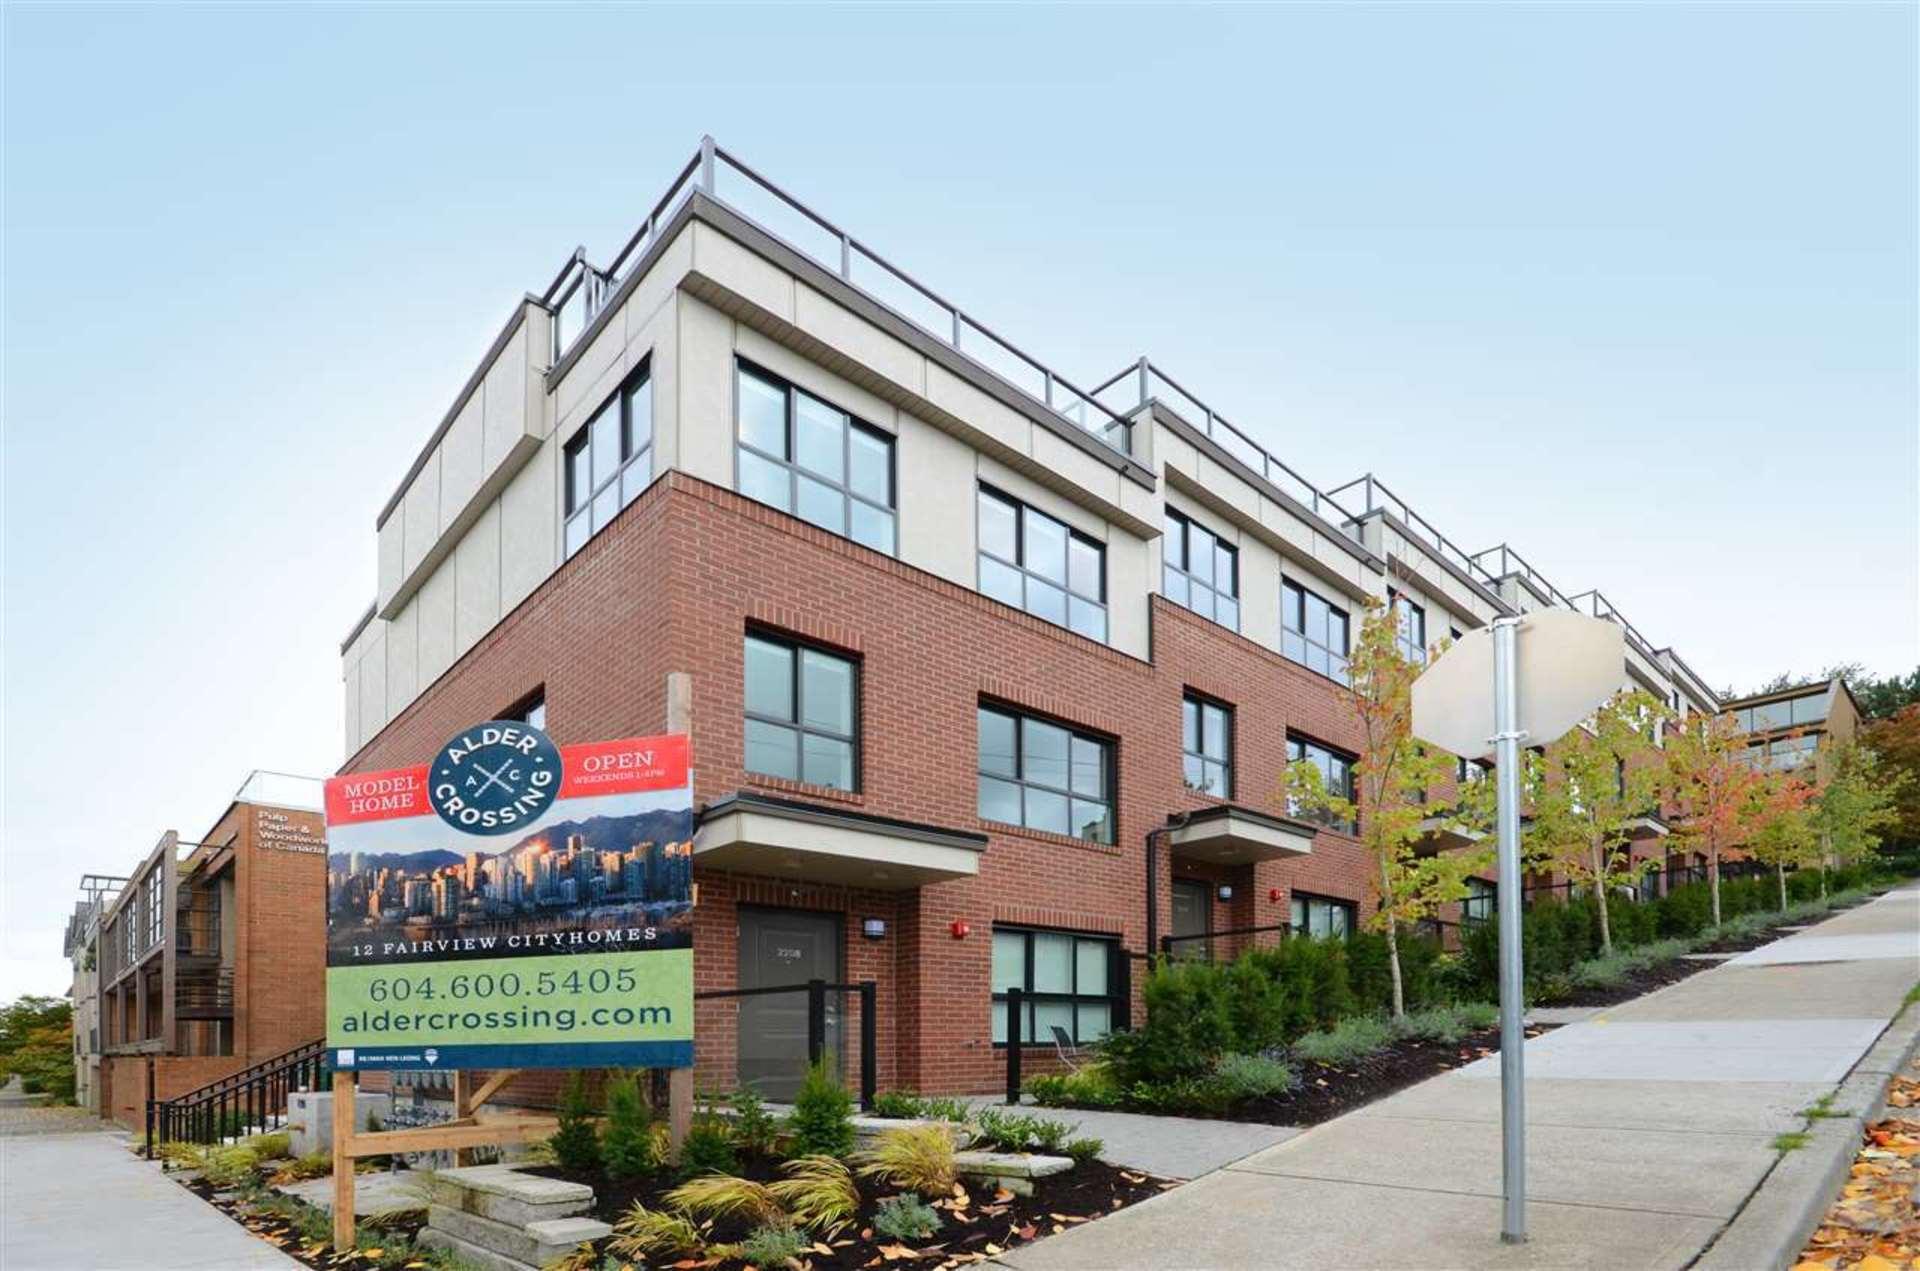 2228-alder-street-fairview-vw-vancouver-west-01 at 2228 Alder Street, Fairview VW, Vancouver West